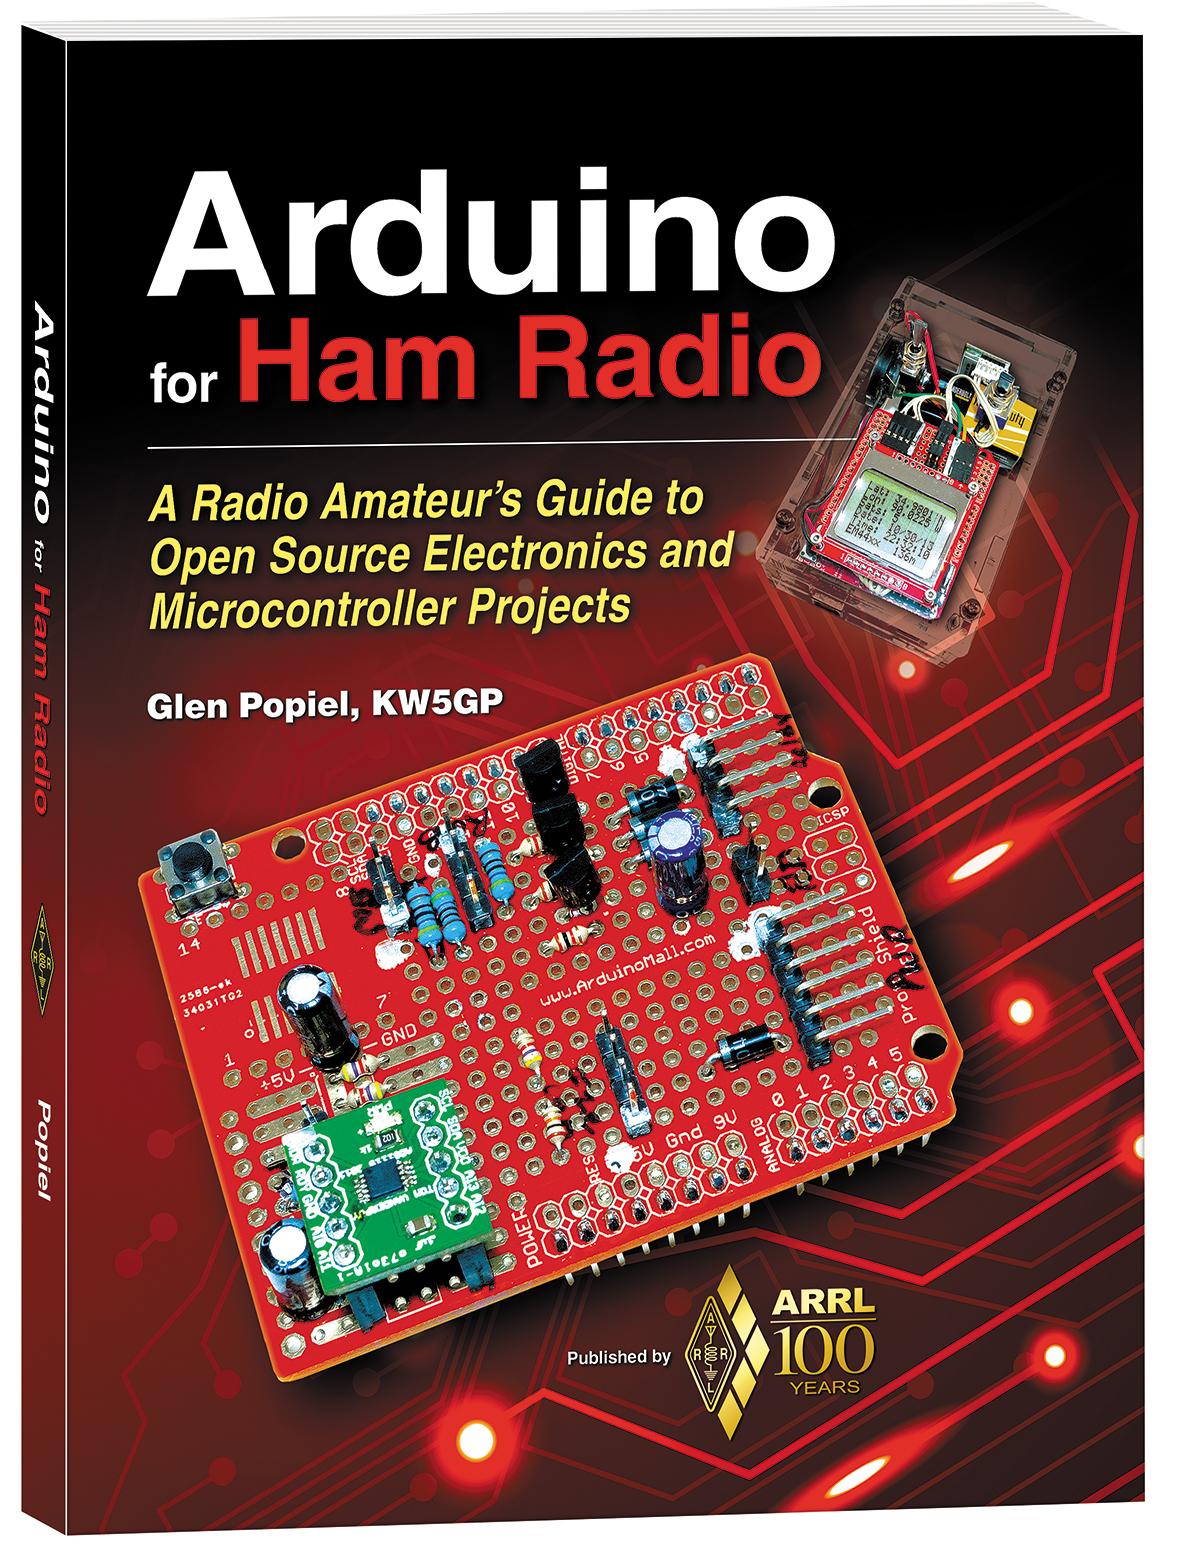 Webcast to feature arduino for ham radio author glen